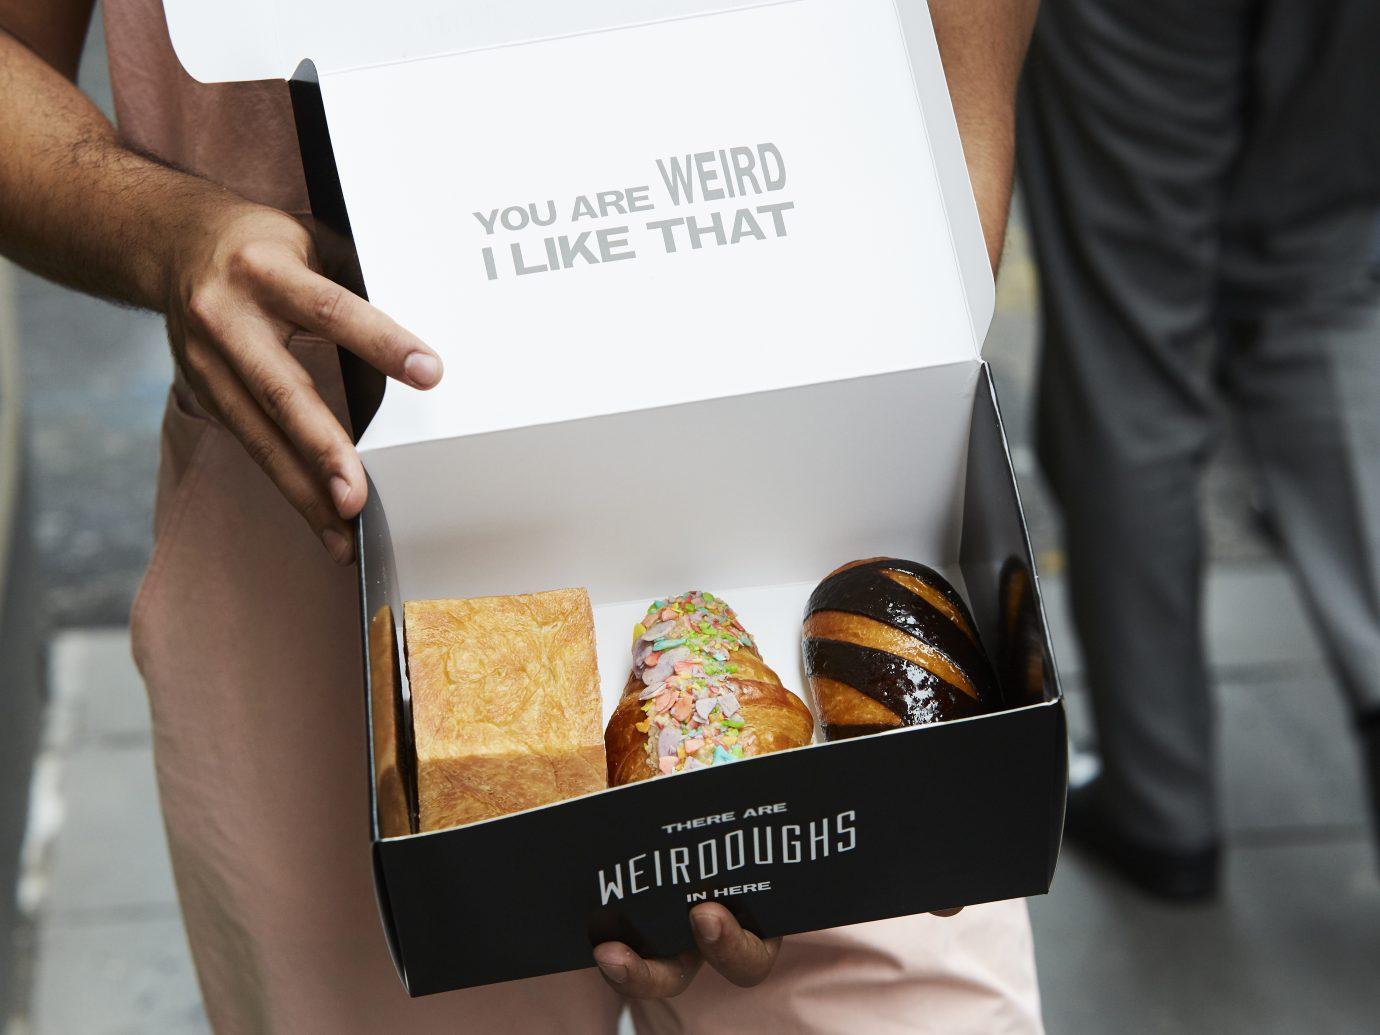 box of doughnuts at Weirdoughs, Melbourne, AUS